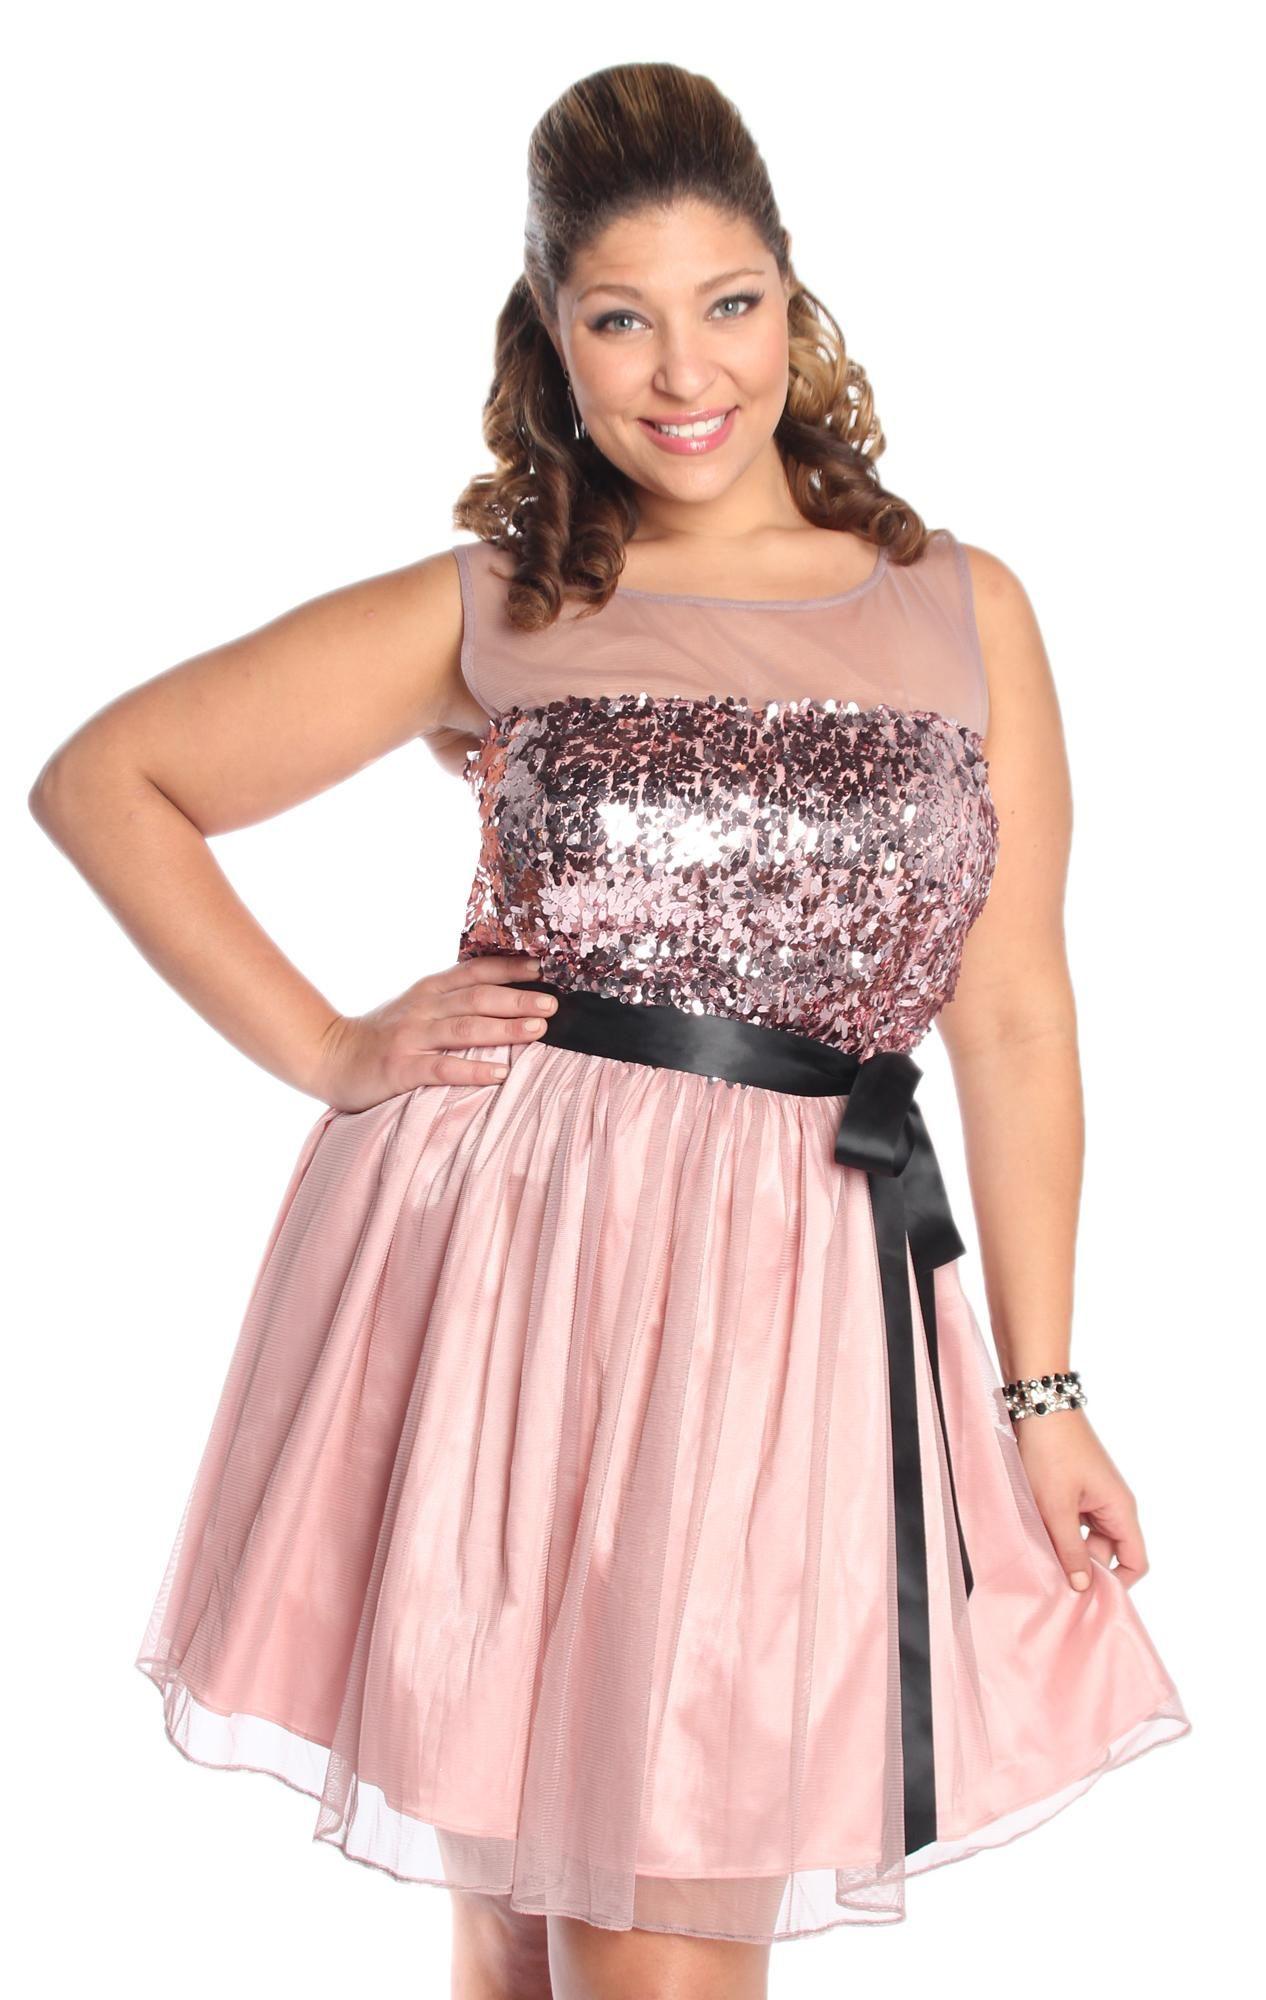 plus size illusion sequin homecoming dress $82.50 | Dresses | Pinterest